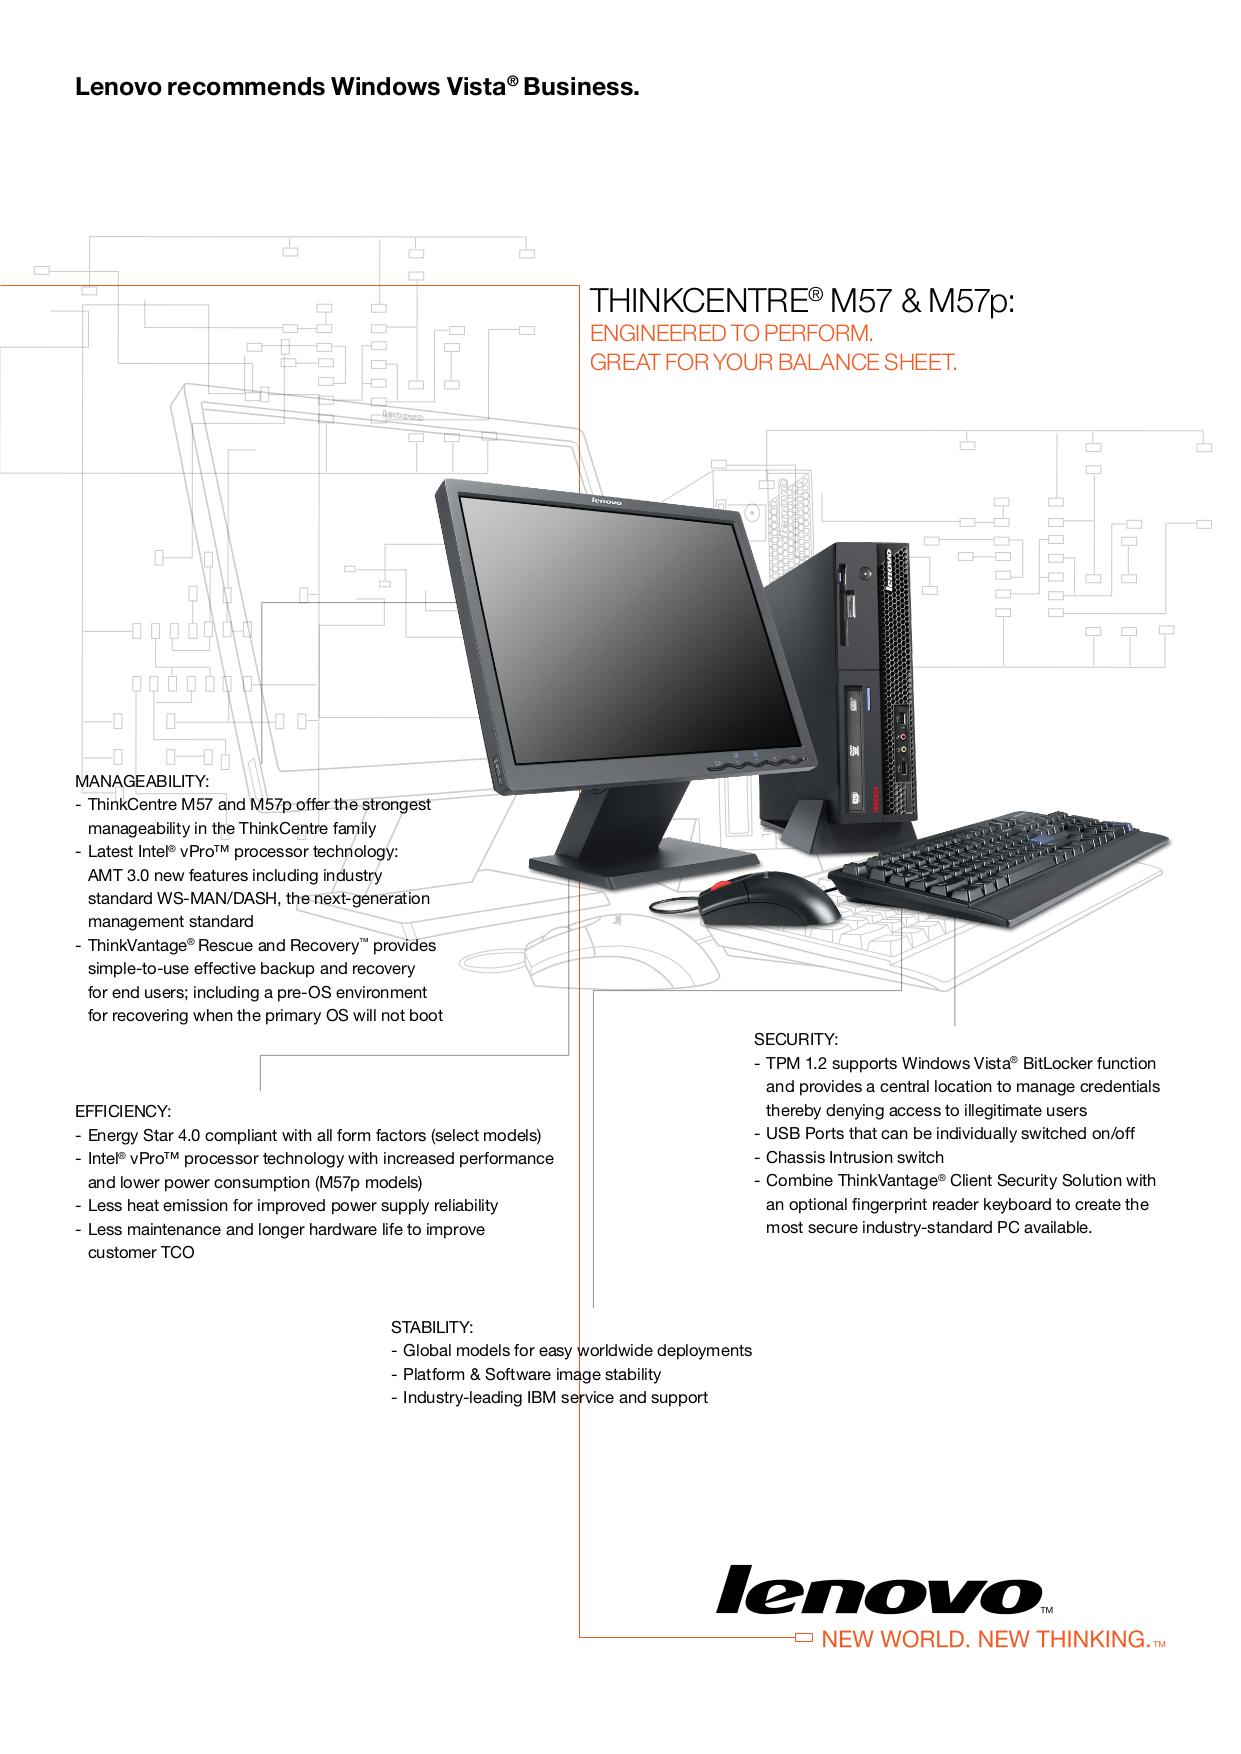 pdf for Lenovo Desktop ThinkCentre M57 6066 manual